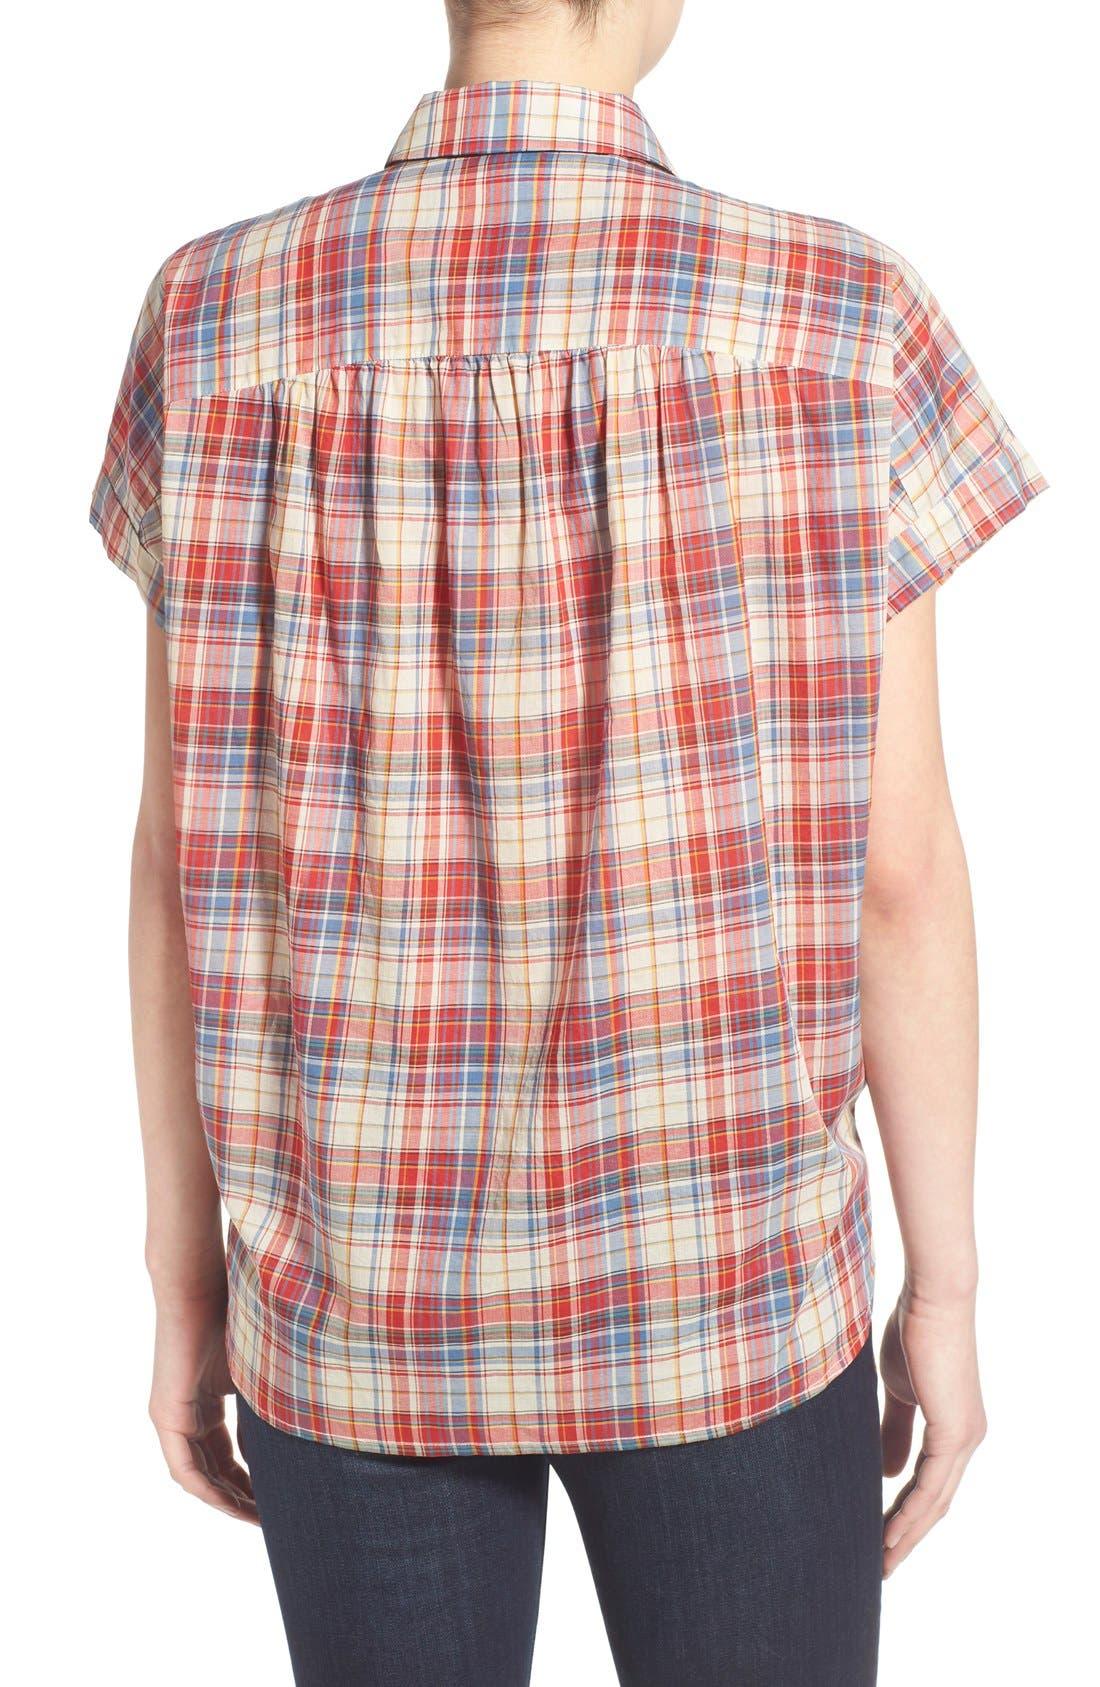 Alternate Image 2  - Madewell Plaid Boxy Cotton Shirt